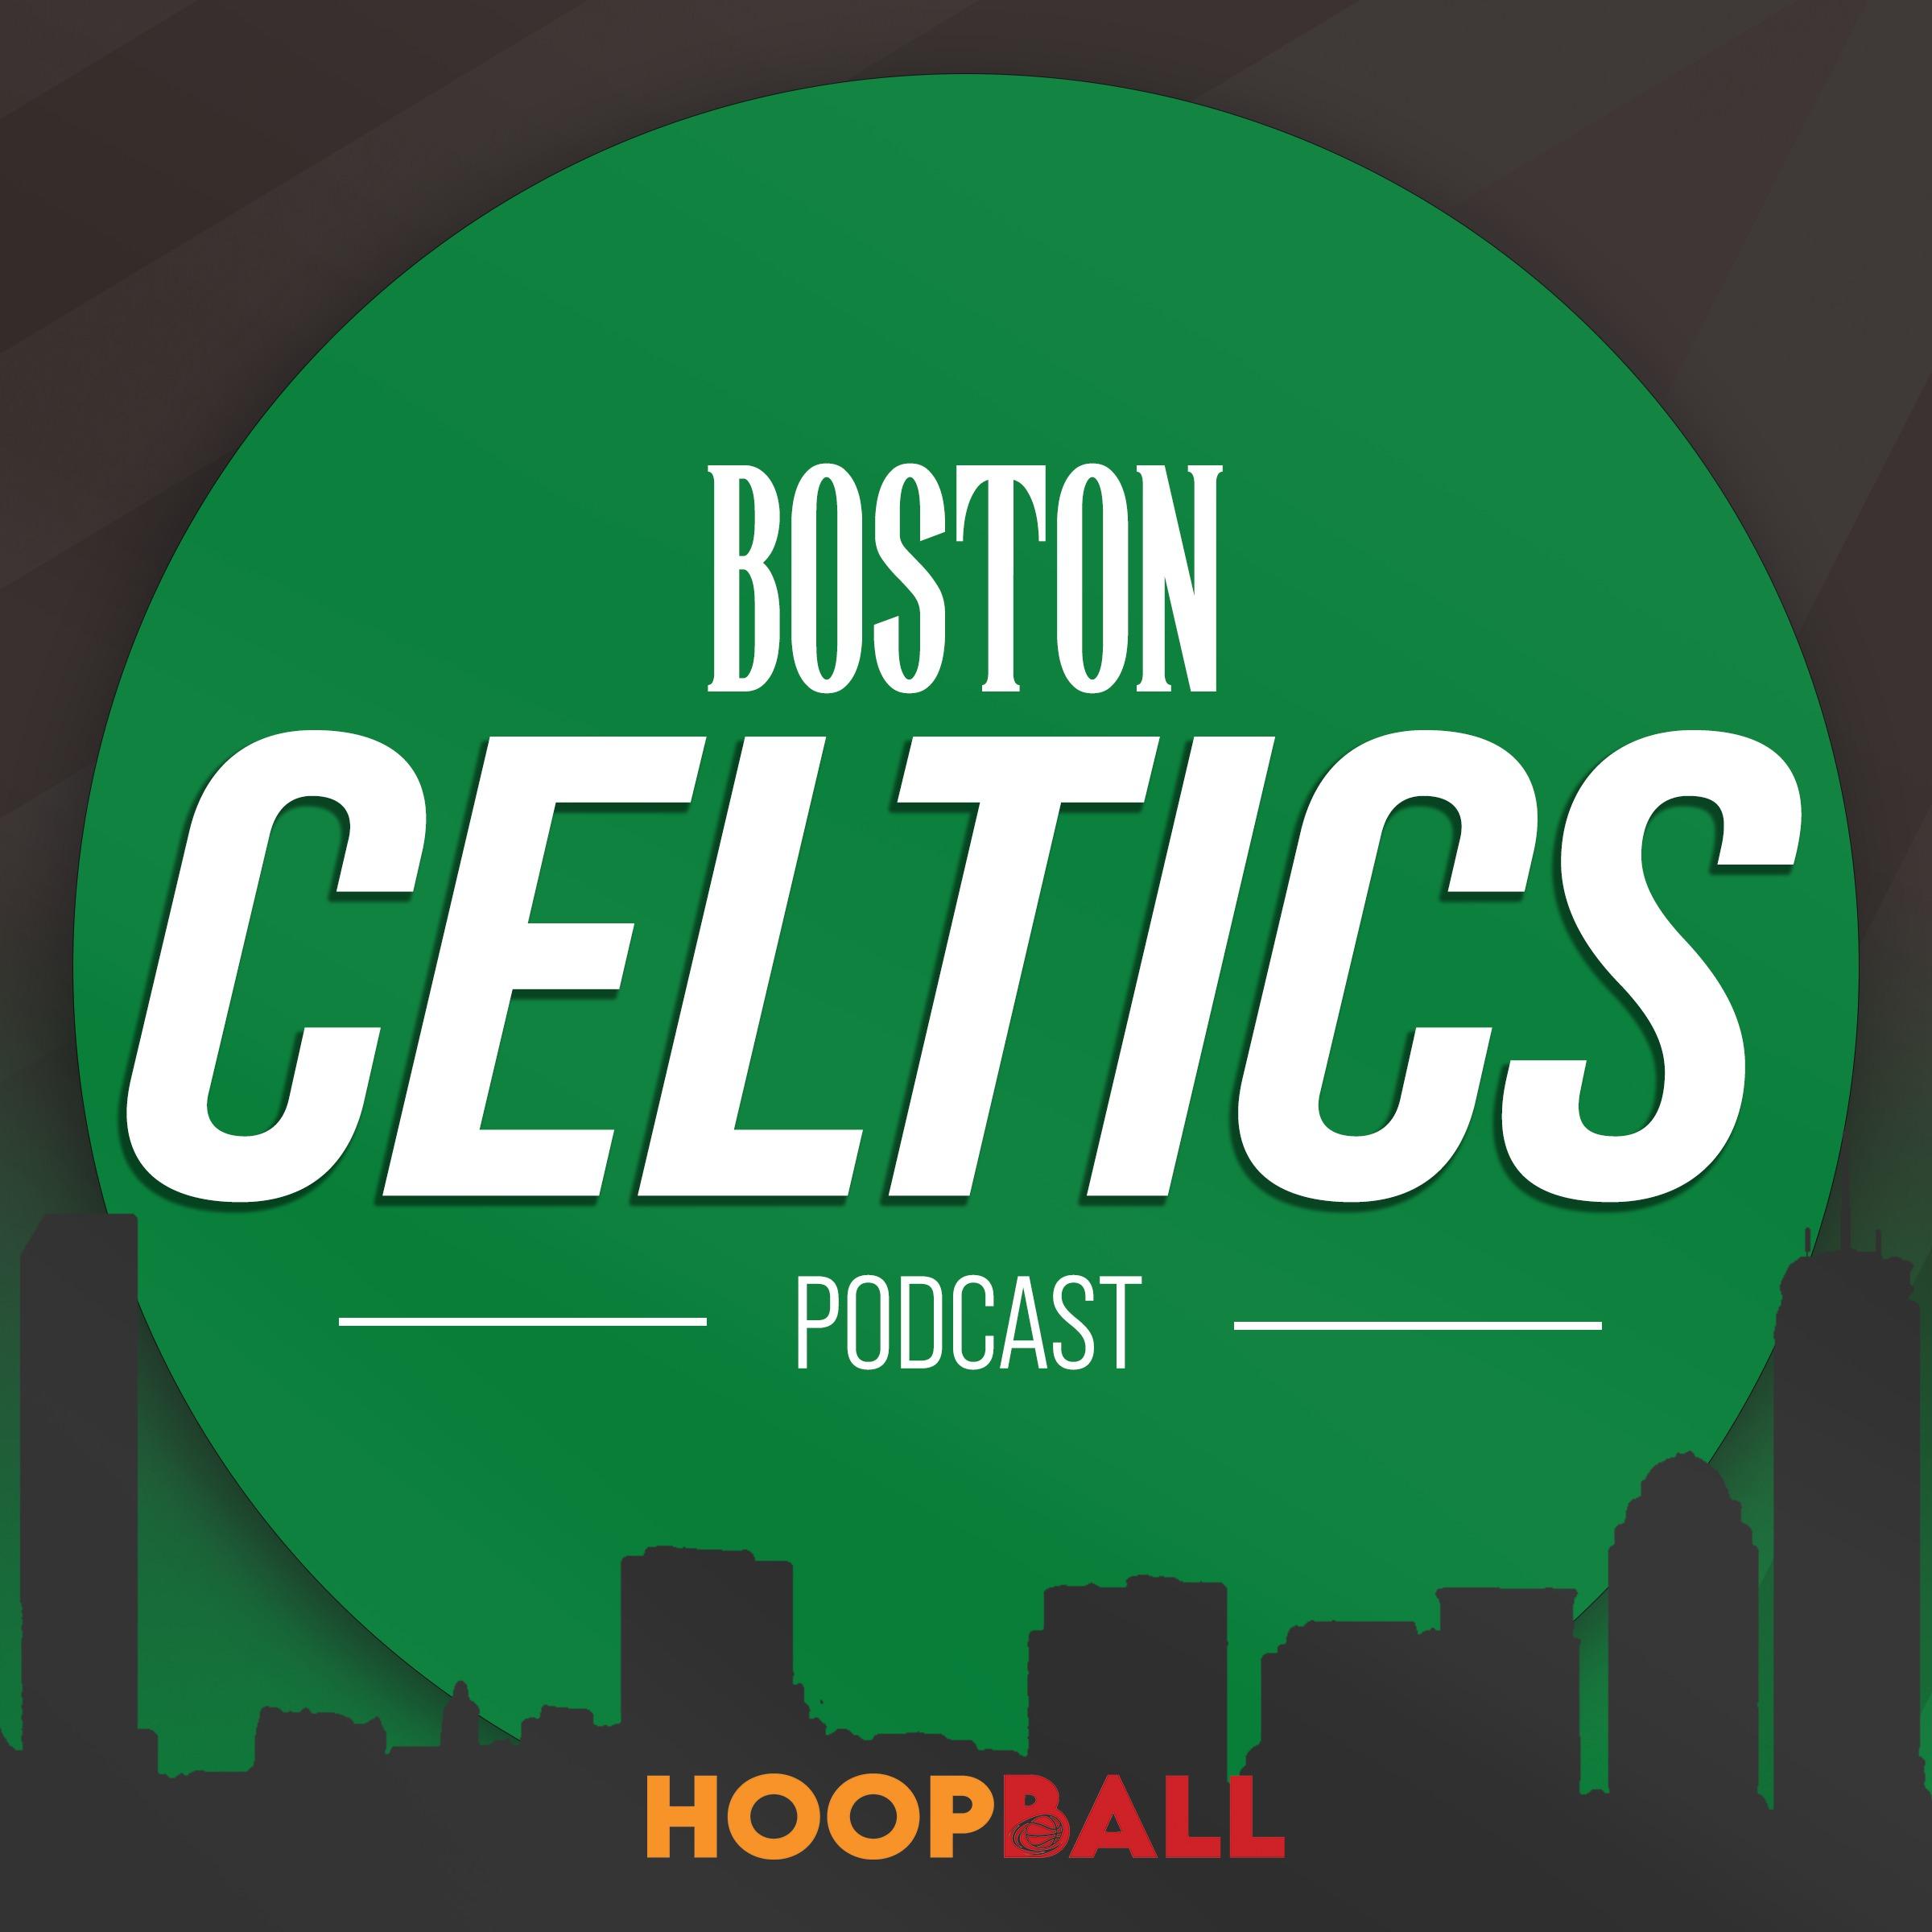 The Hoop Ball Boston Celtics Podcast